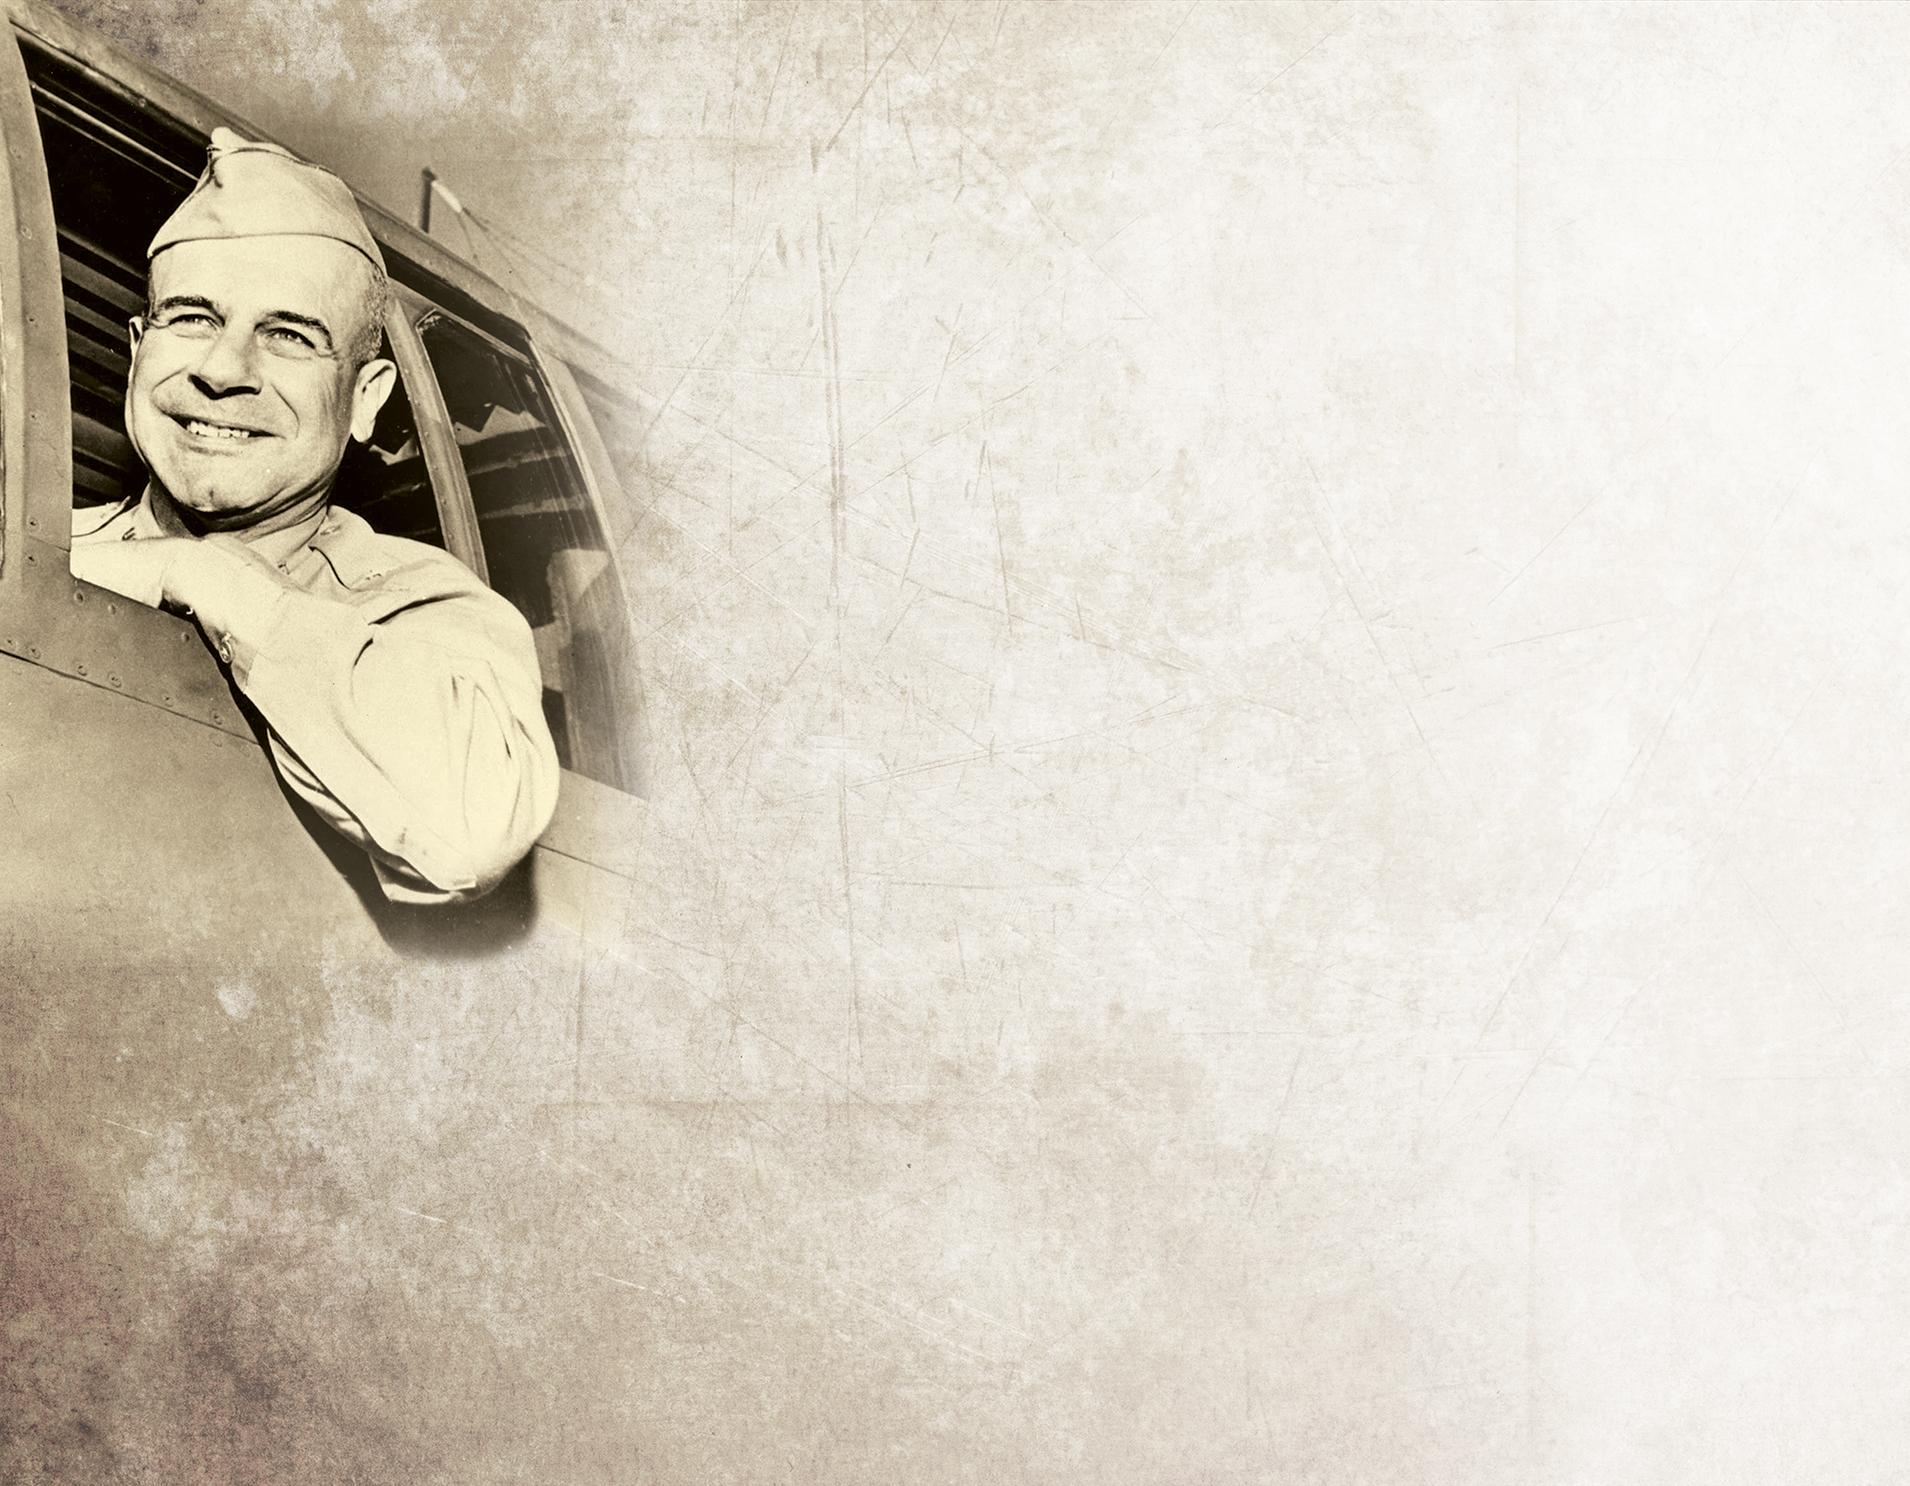 Jimmy Doolittle headshot on antique paper background